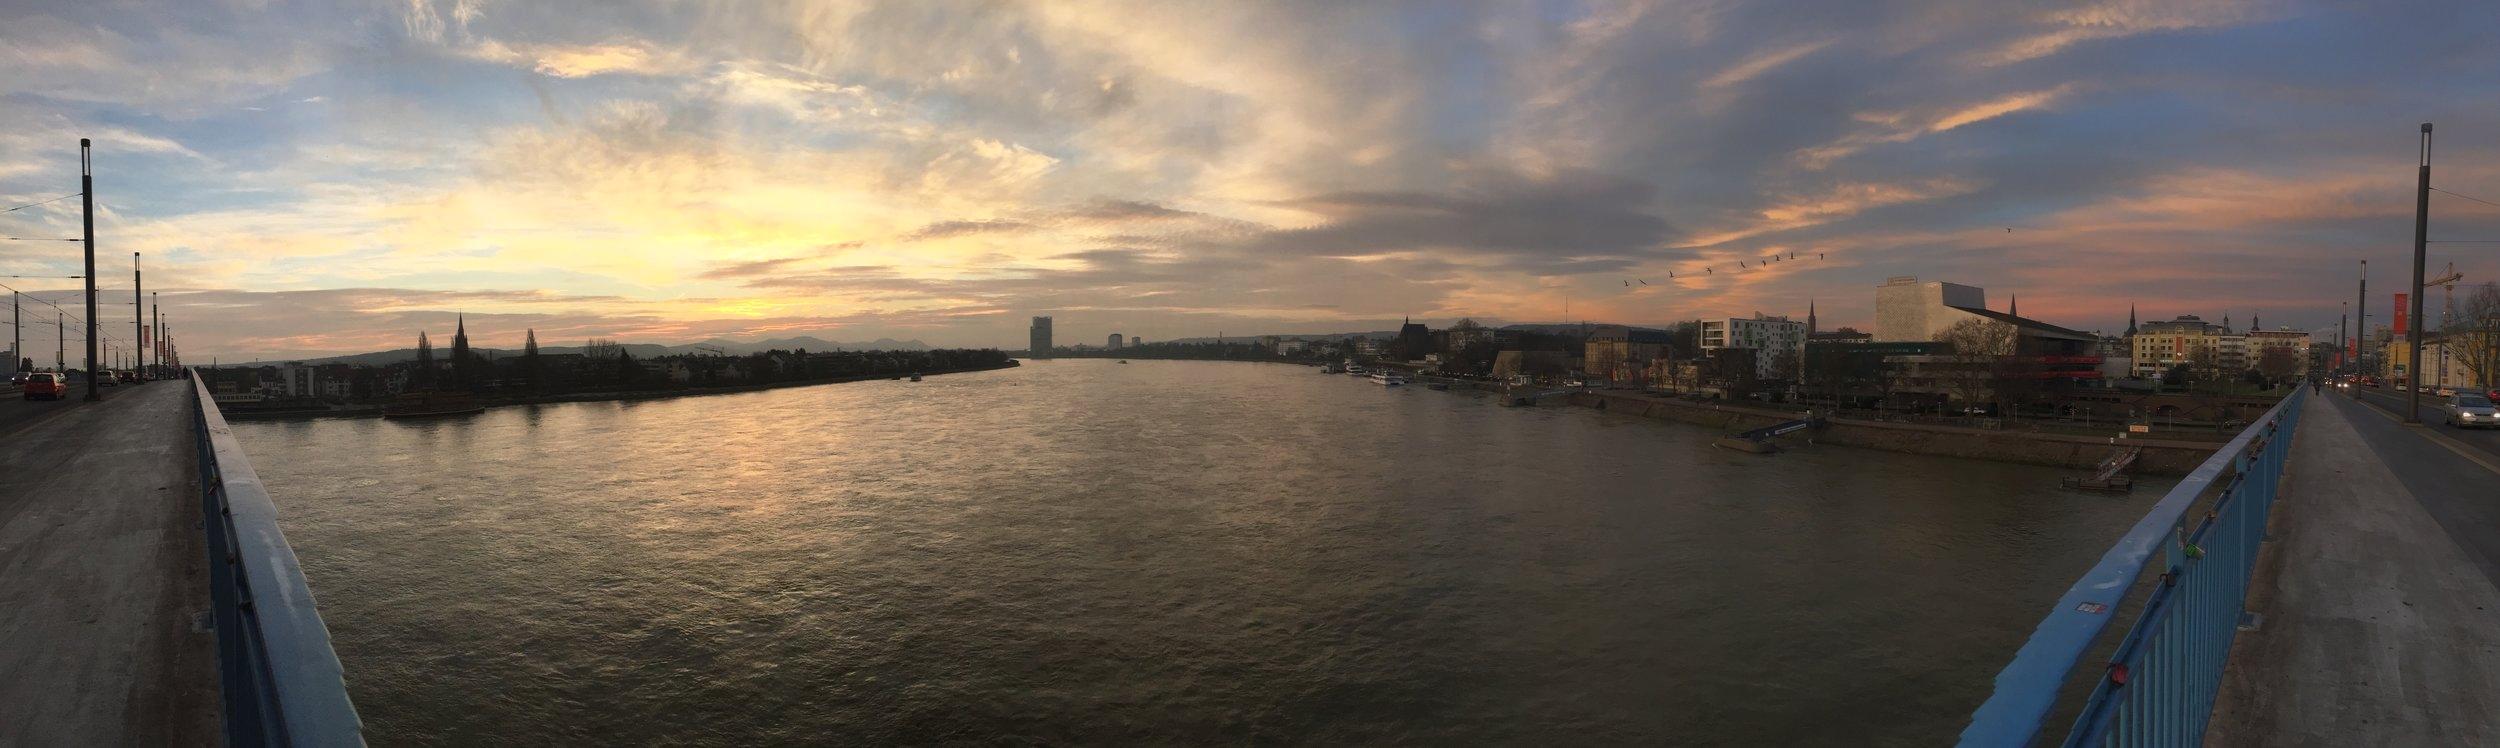 sunrise from the rhine river bonn, germany